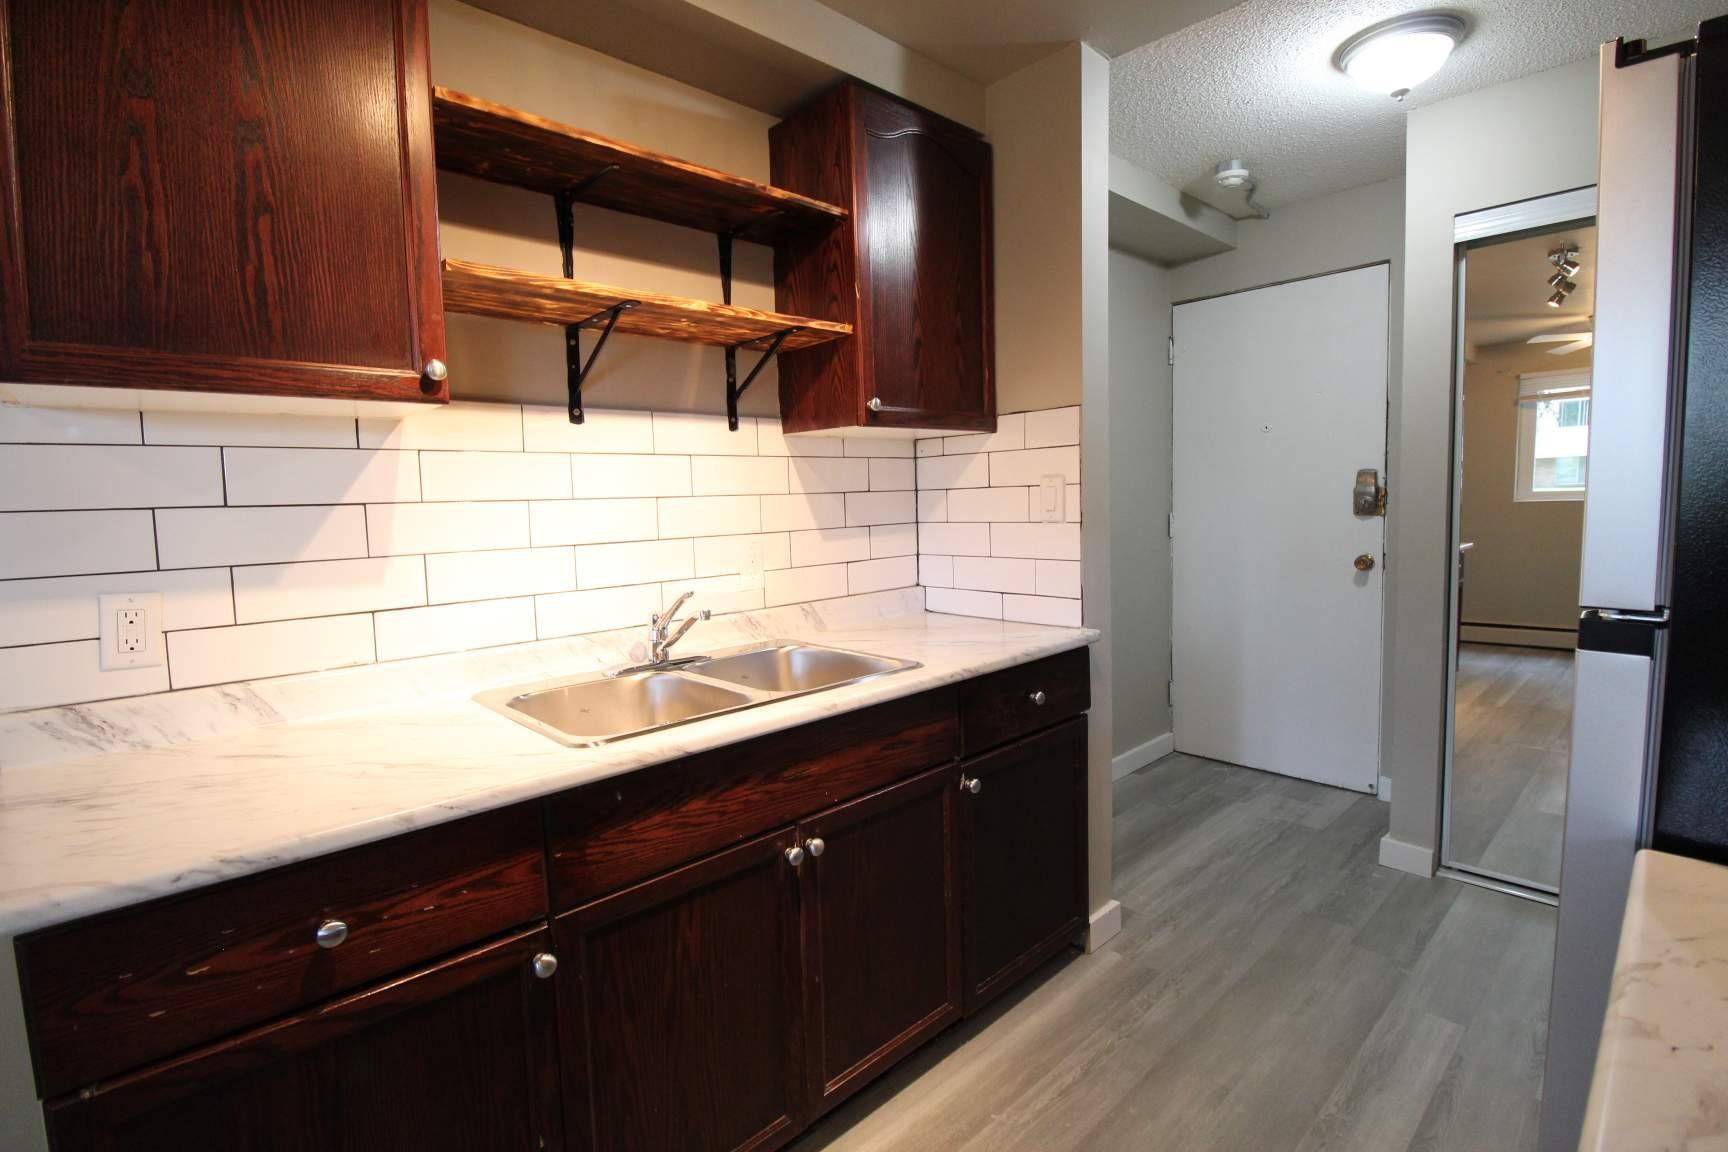 10719 110 St NW, Edmonton, AB - $849 CAD/ month